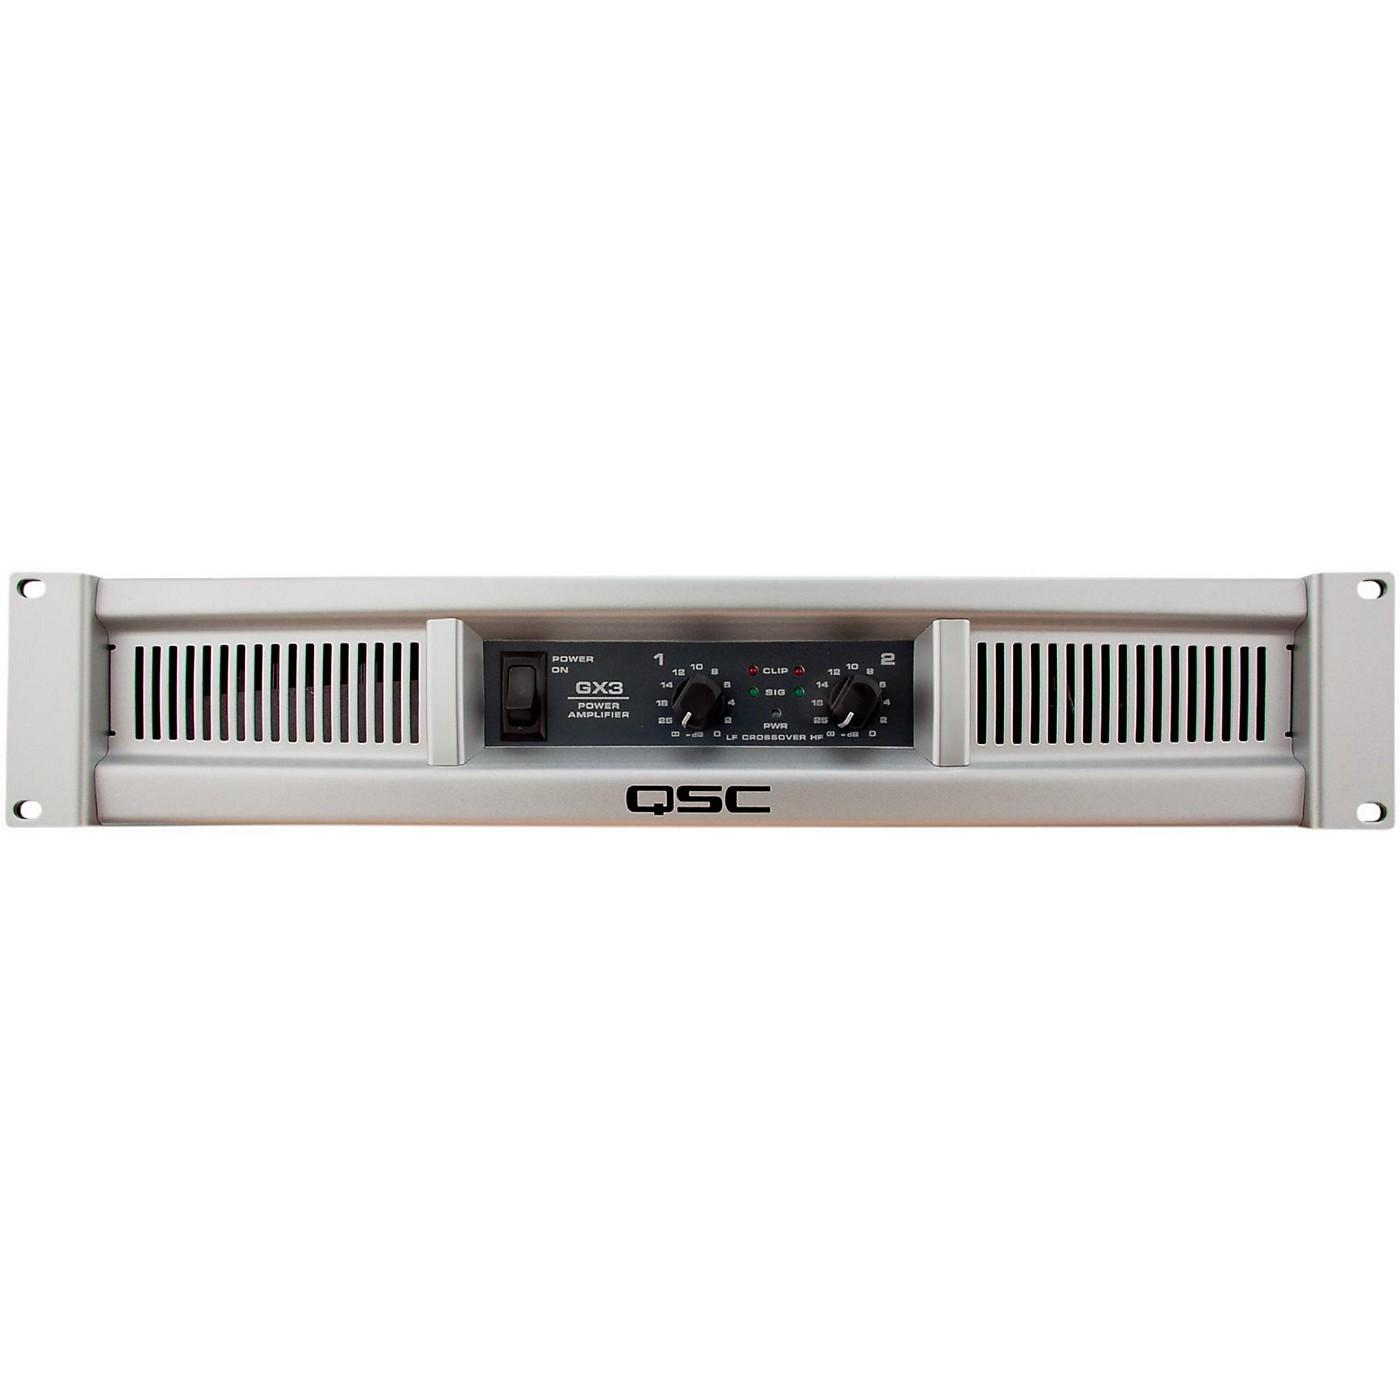 QSC GX3 Stereo Power Amplifier thumbnail